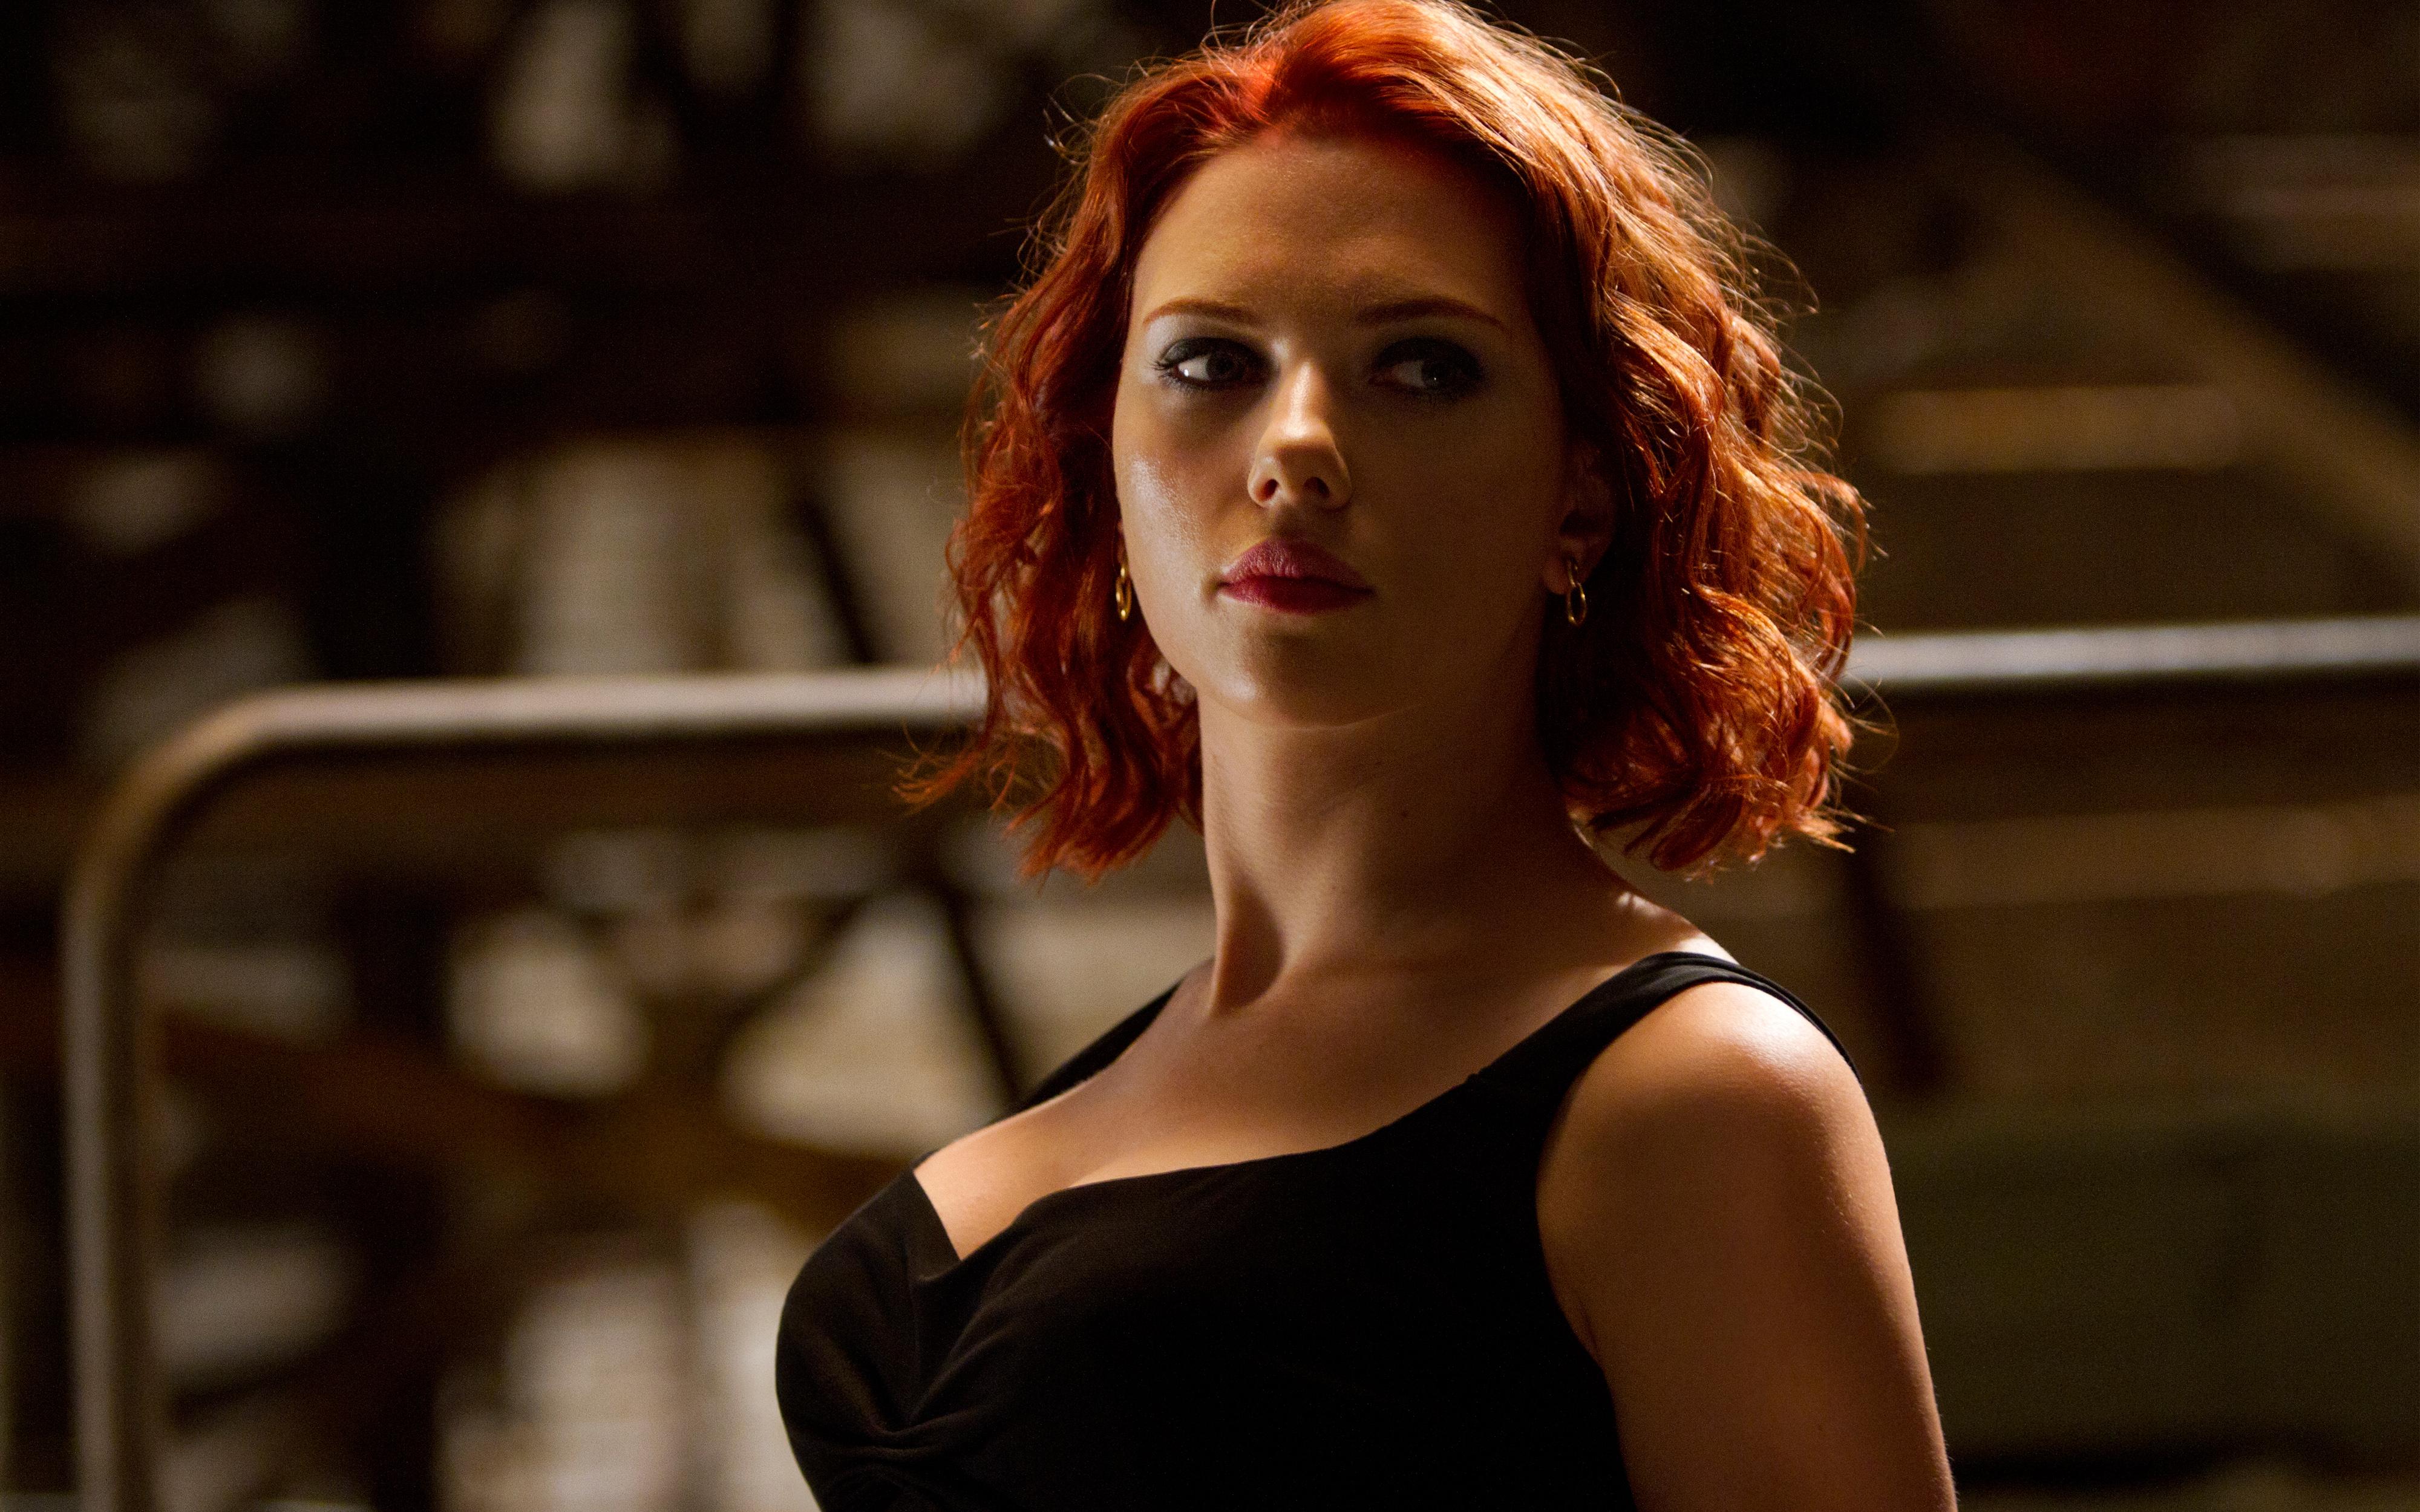 Scarlett Johansson kön video